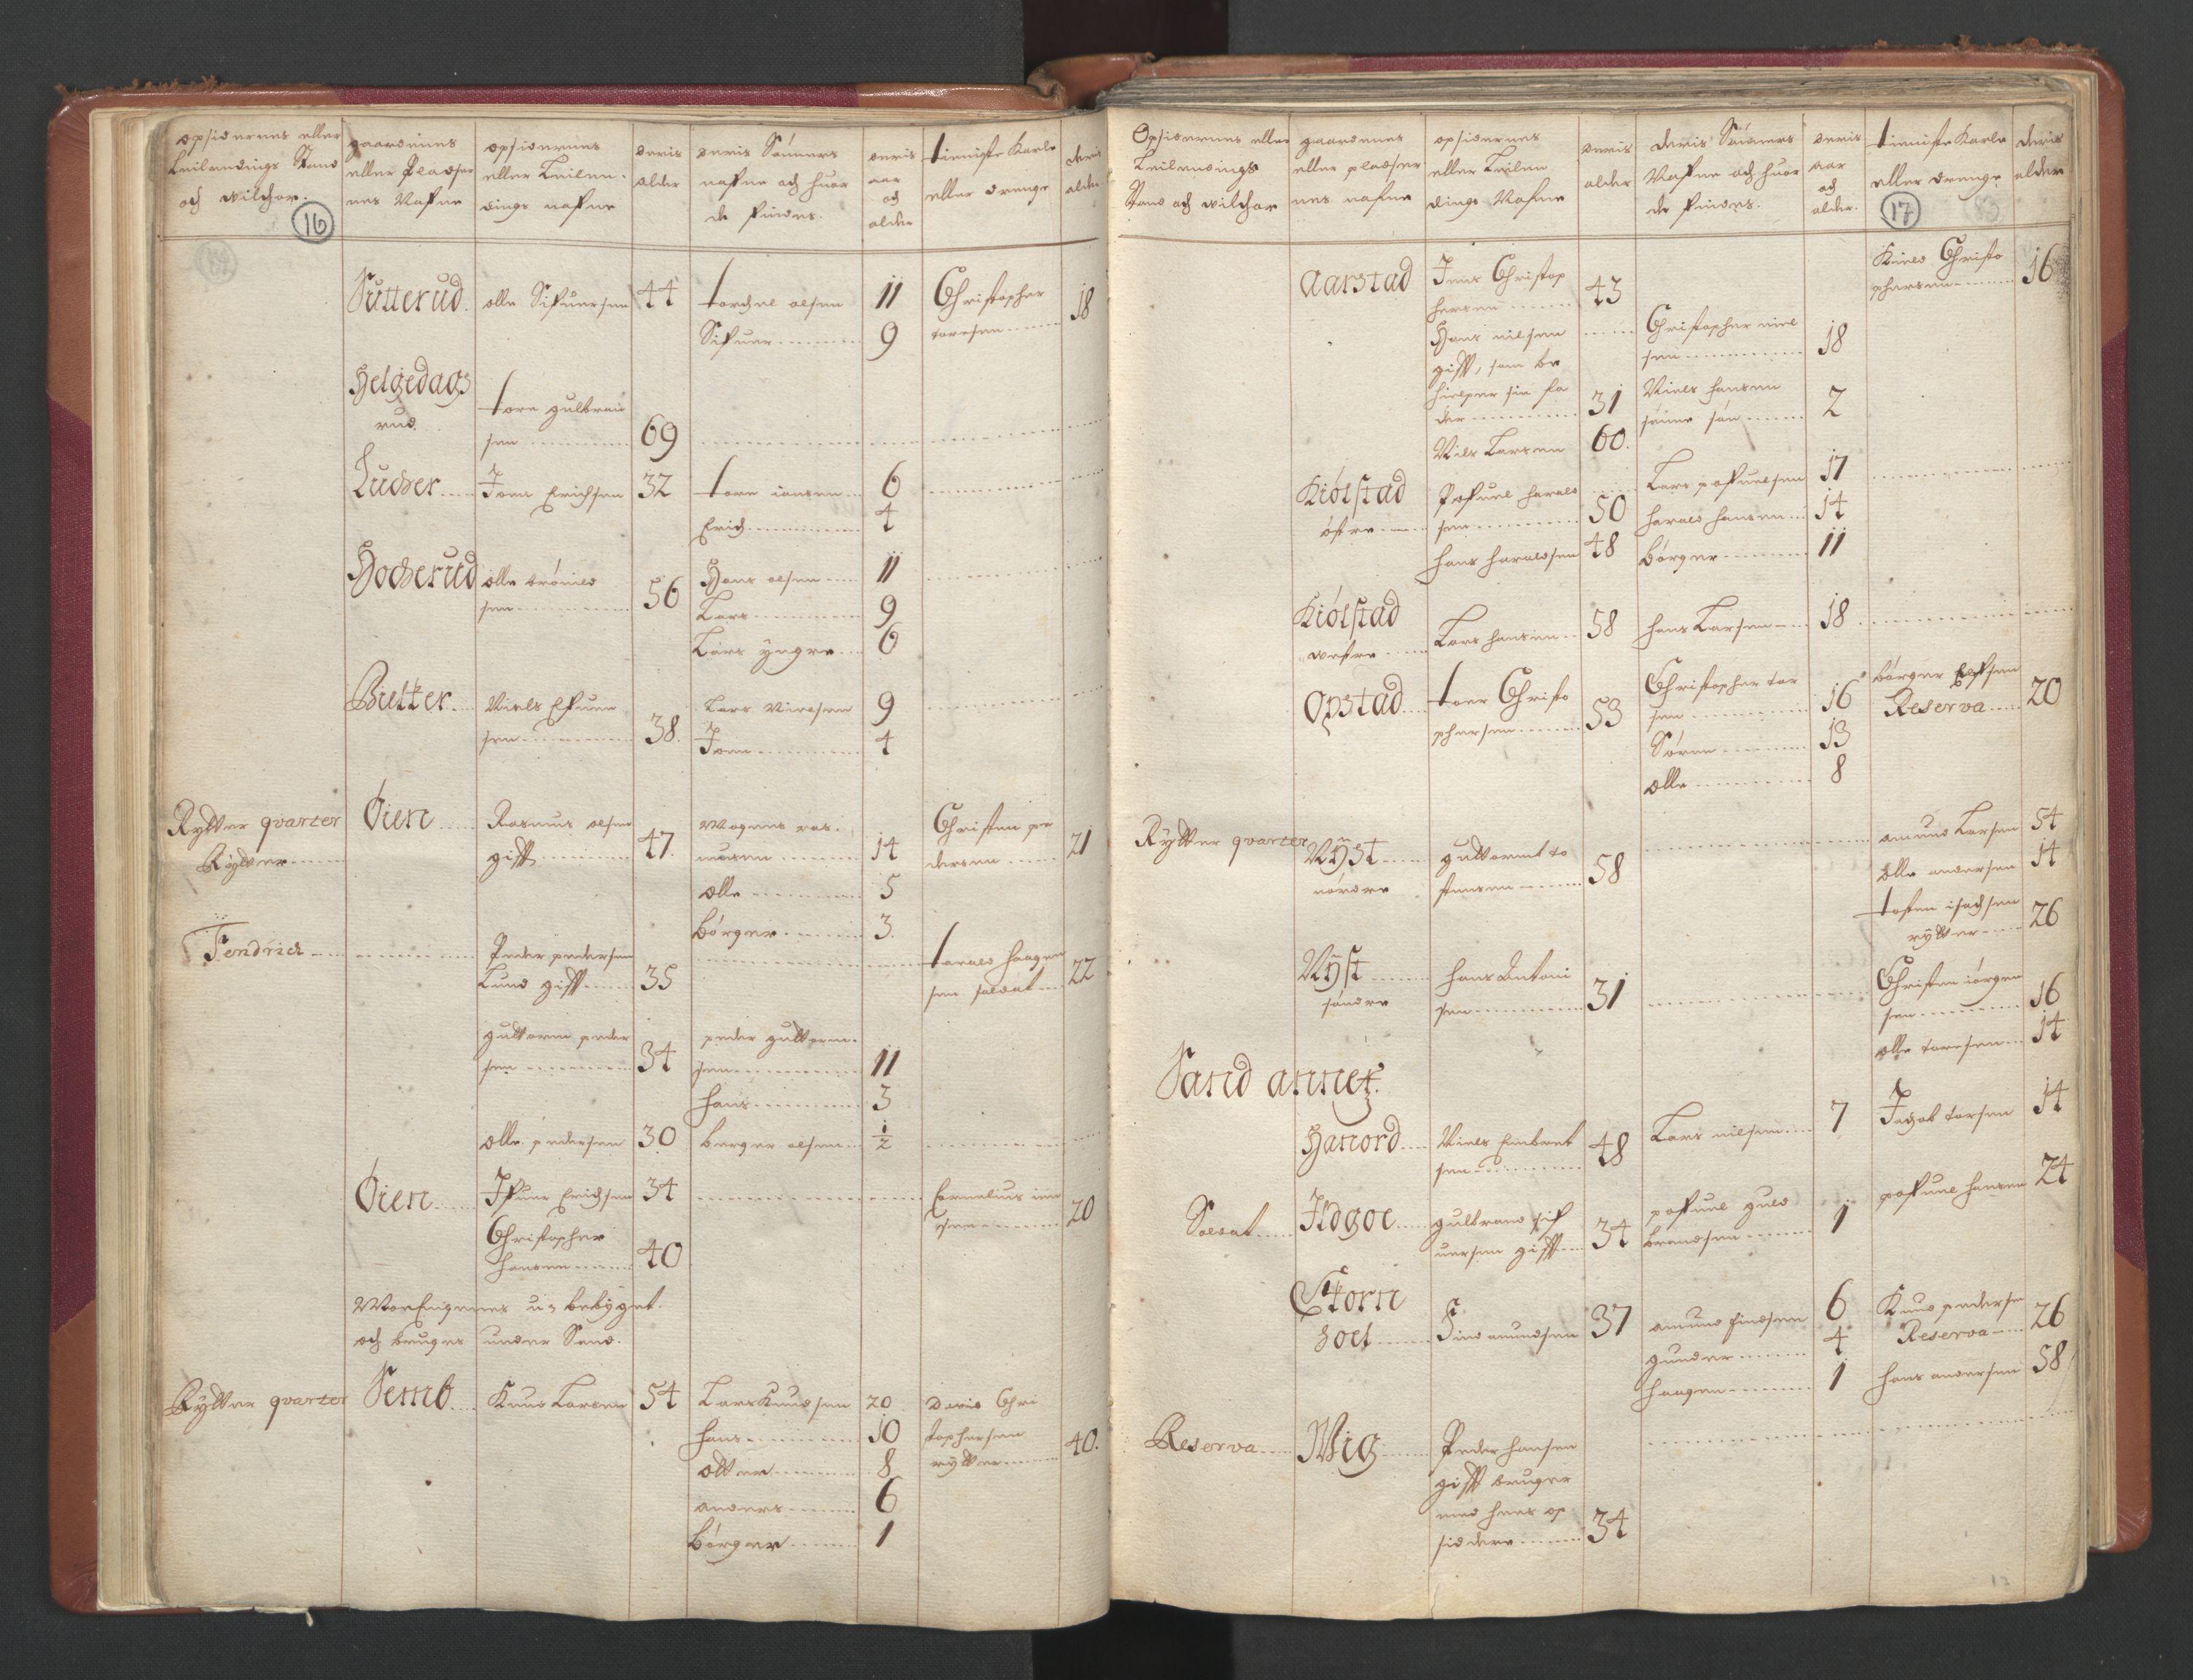 RA, Manntallet 1701, nr. 2: Solør, Odal og Østerdal fogderi og Larvik grevskap, 1701, s. 16-17